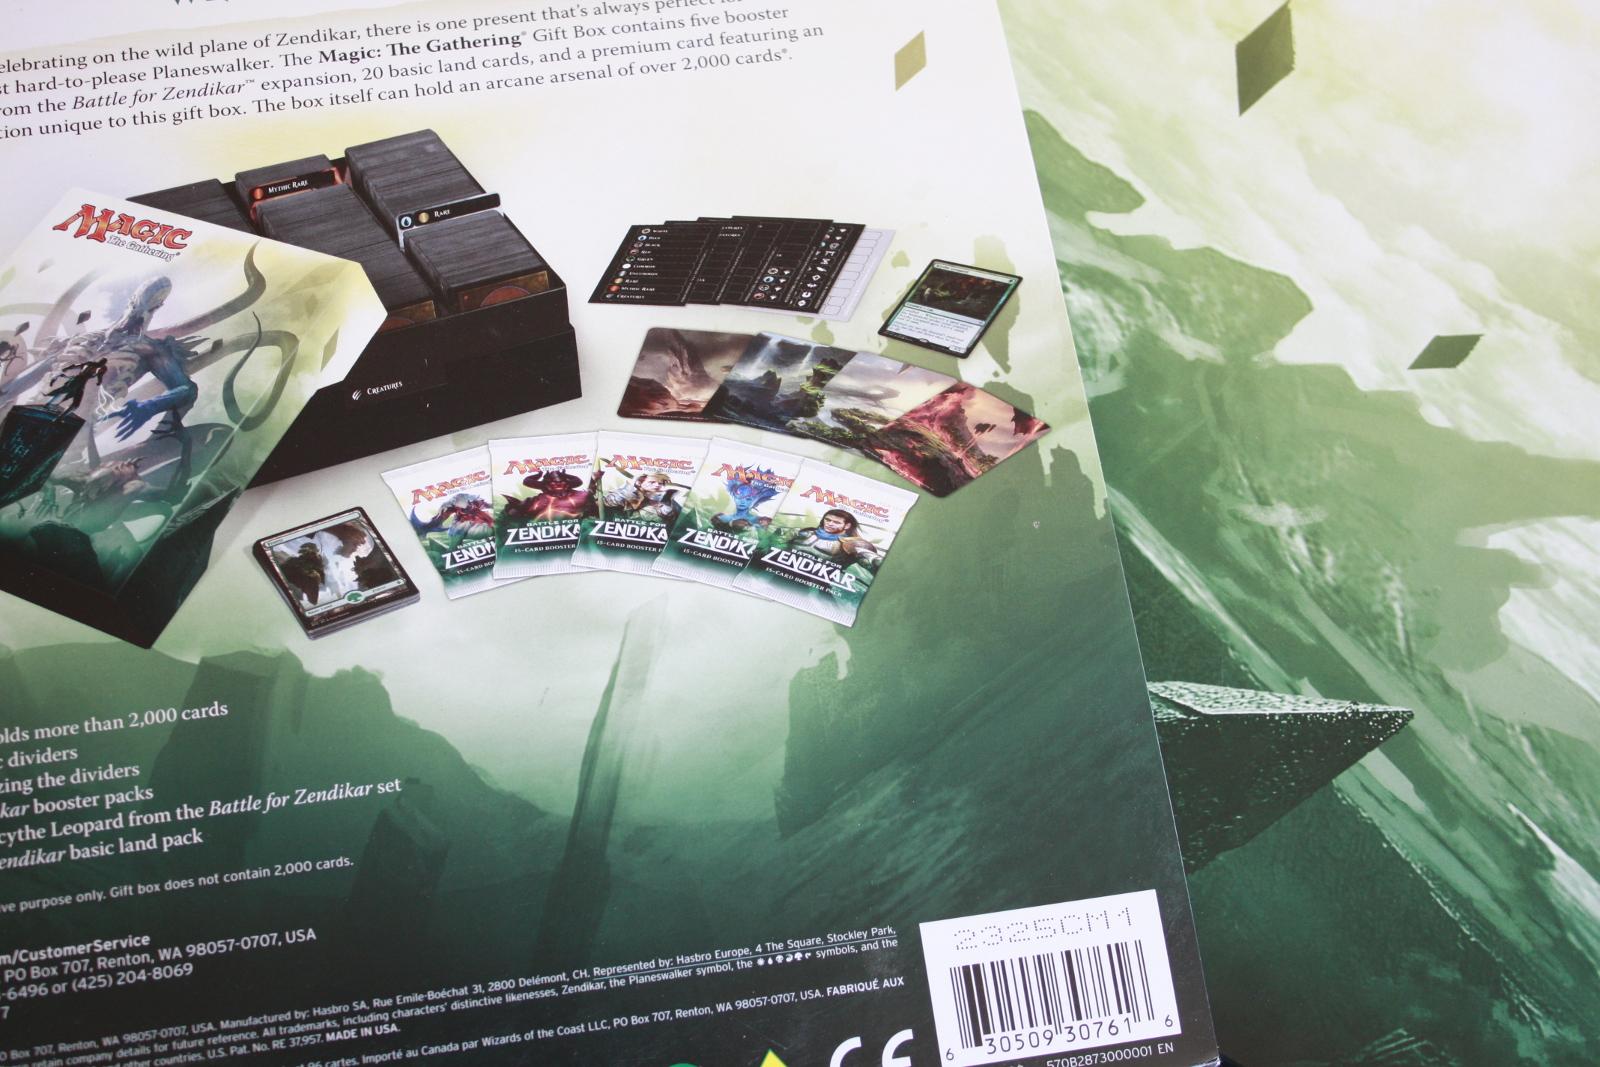 BfZ Holiday Gift Box 005